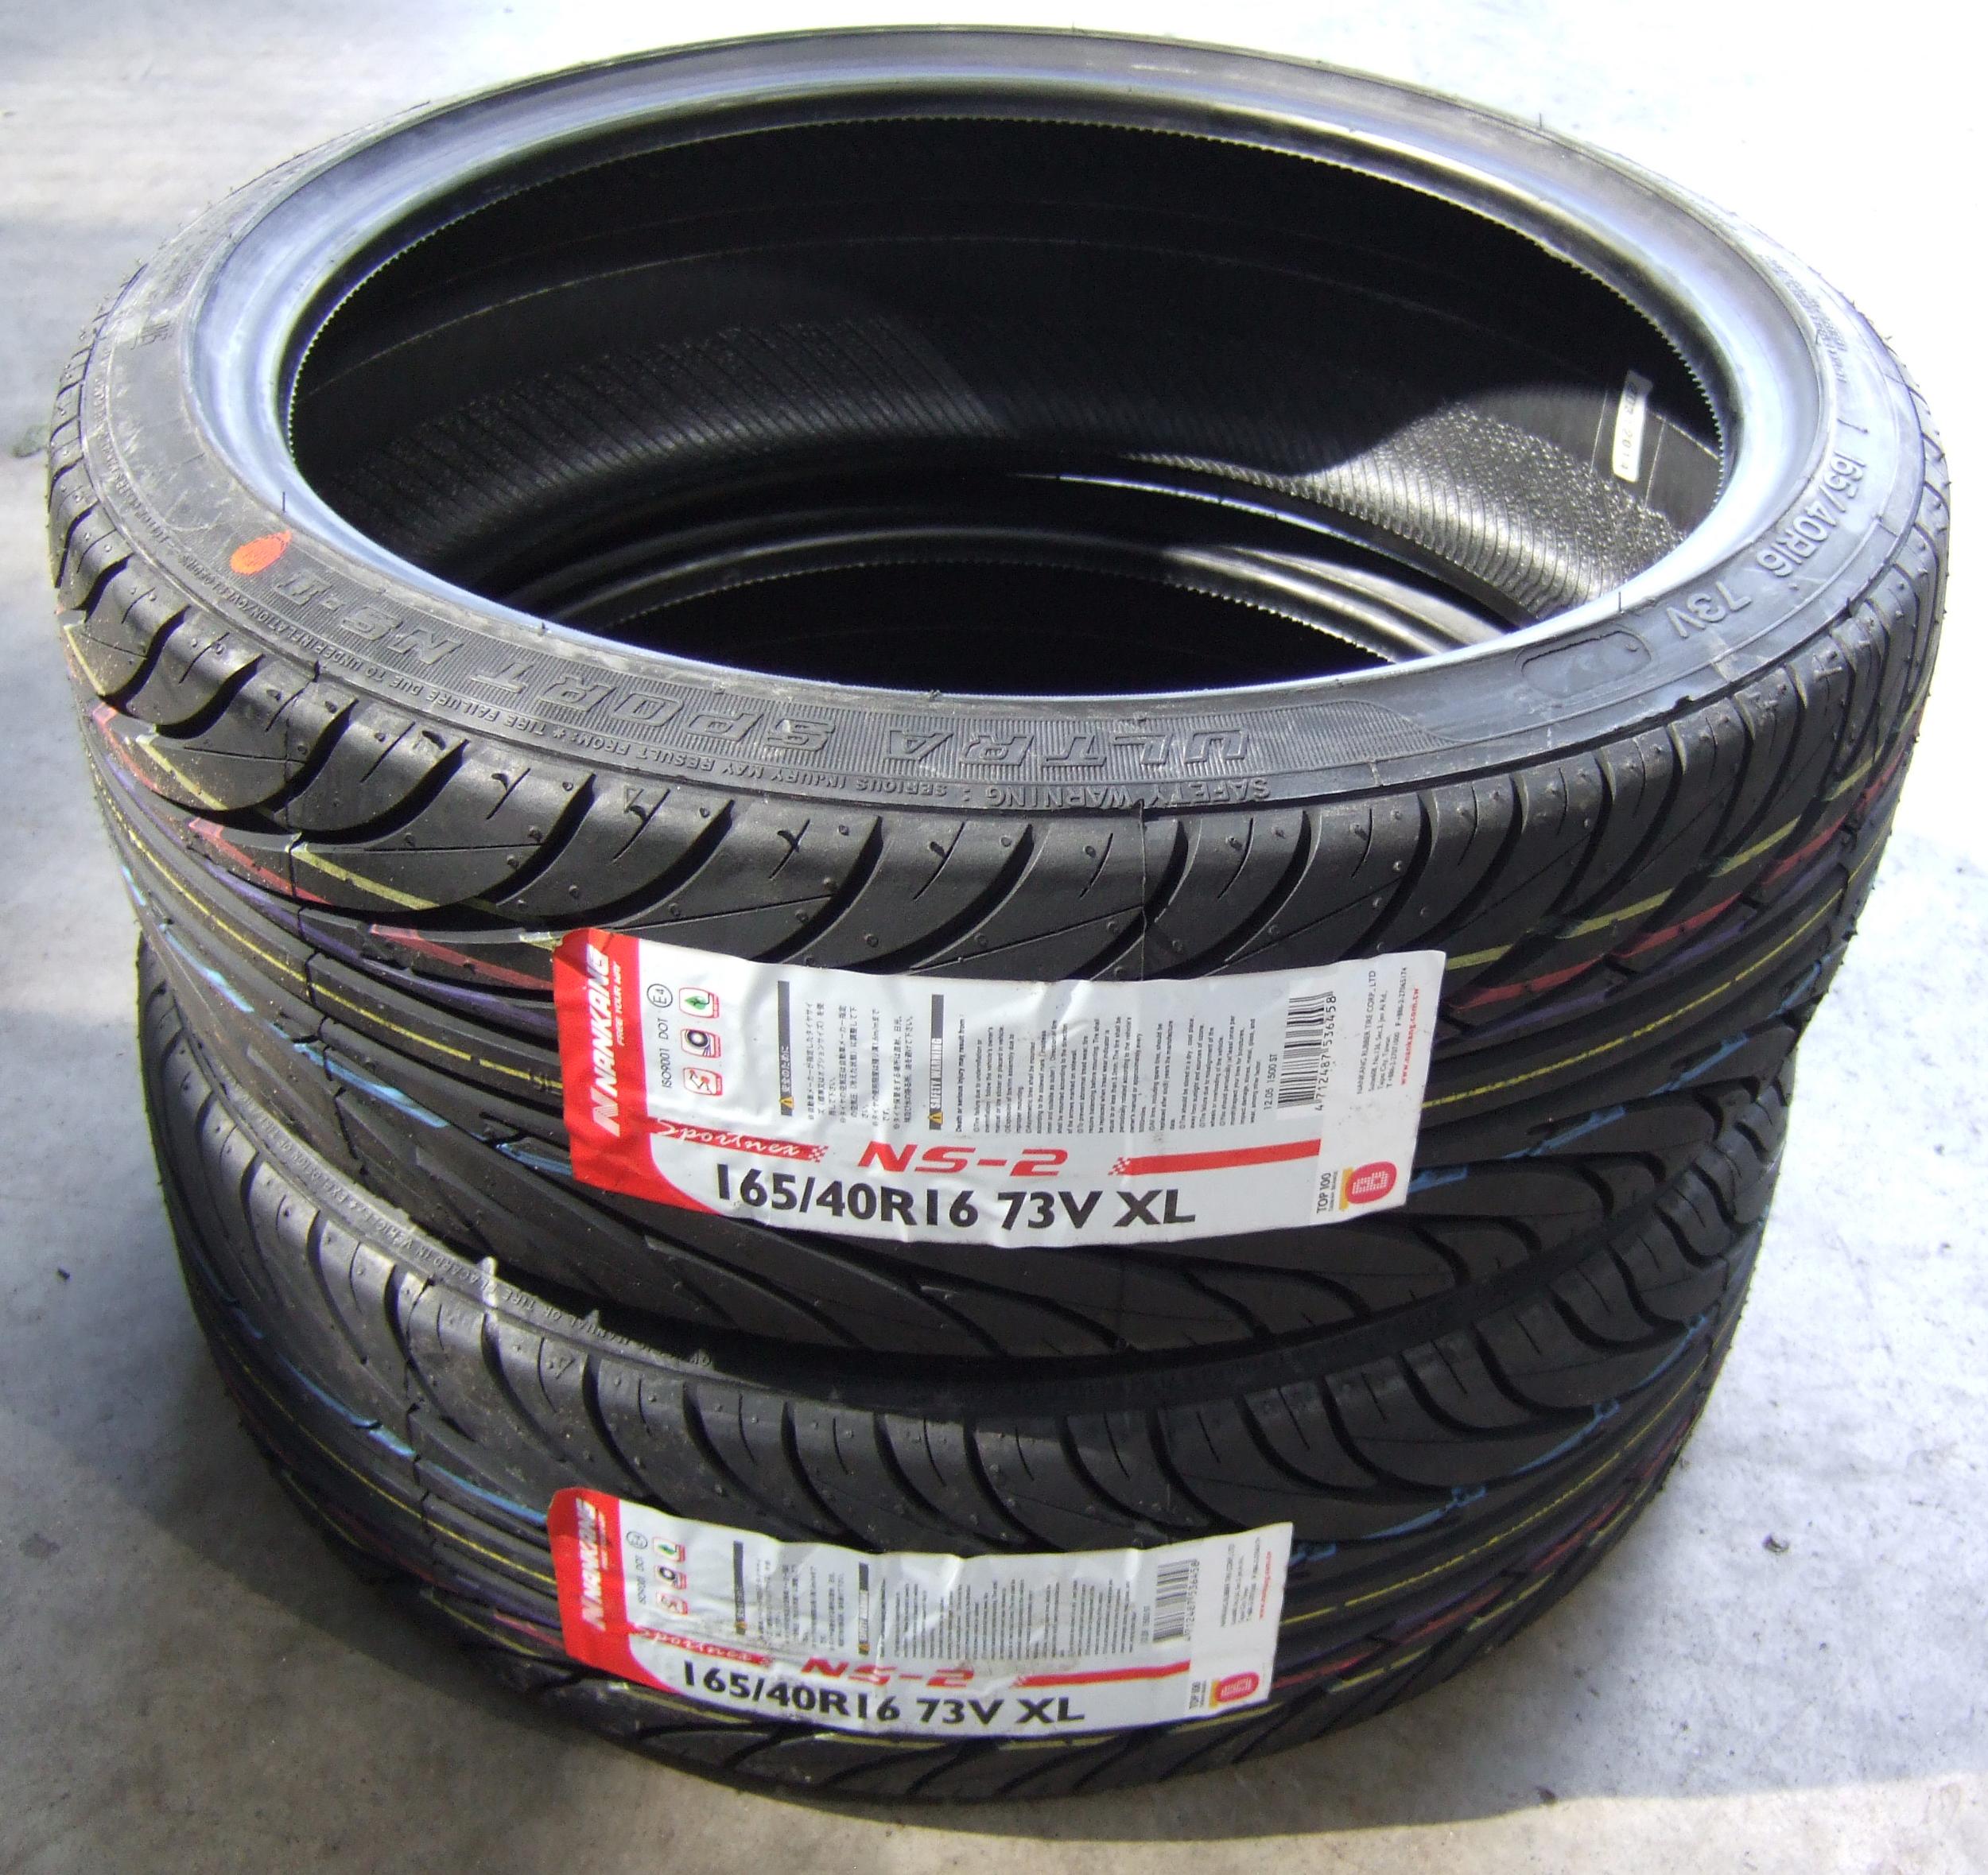 ... about 165/40/16 Nankang Sport NS2 Tyres 1654016 72V 165/40 16 x2